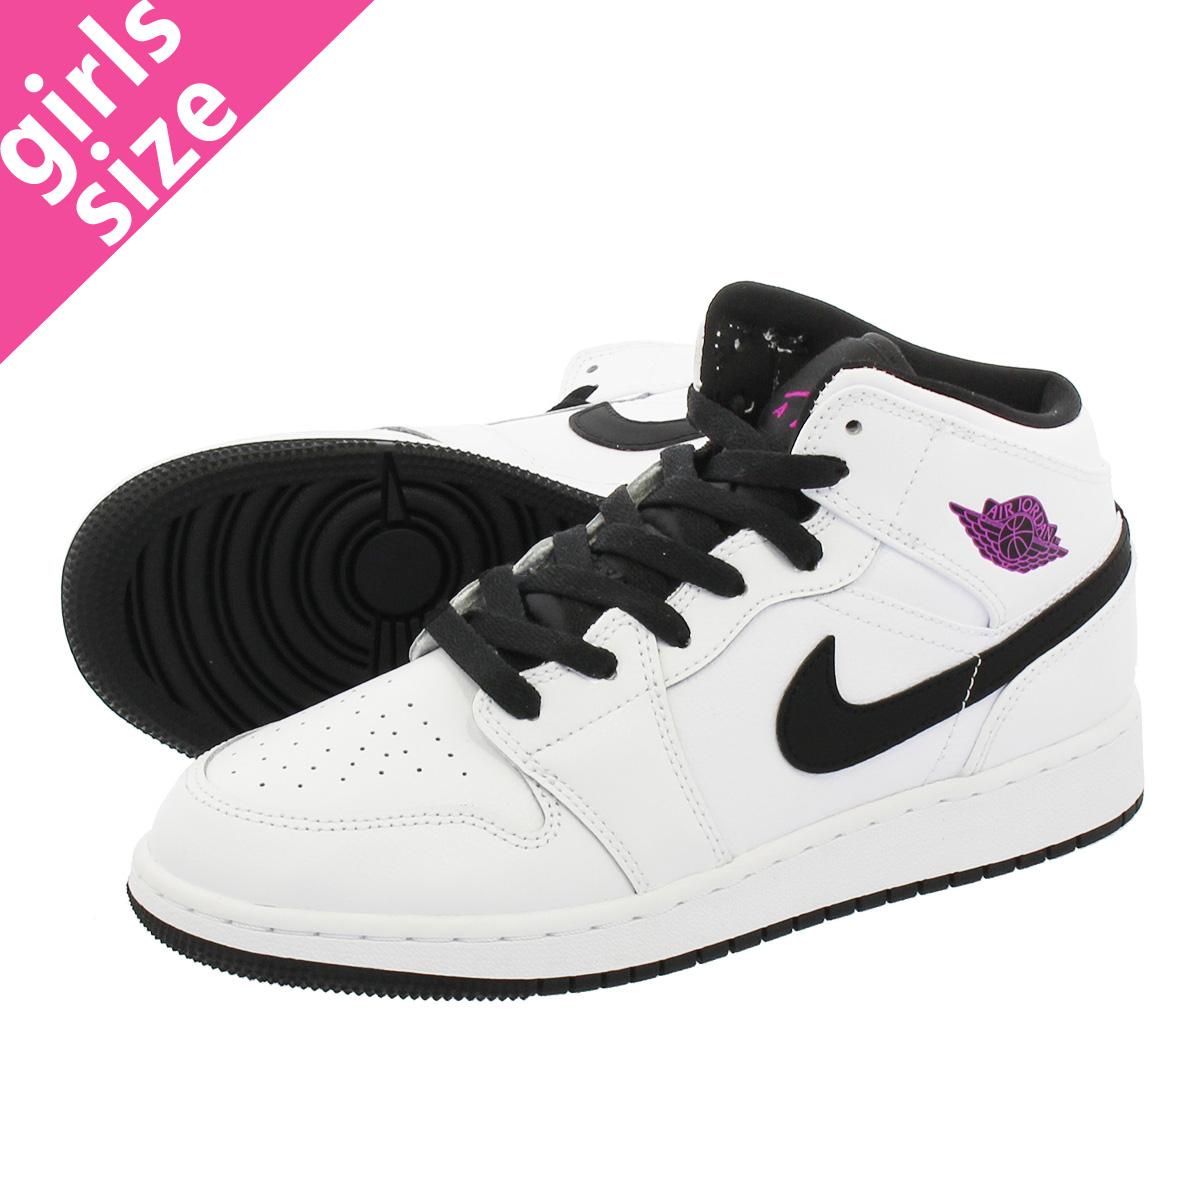 843ee8c08d1b NIKE AIR JORDAN 1 MID GG Nike Air Jordan 1 mid GG WHITE BLACK FUSCHIA BLAST  555